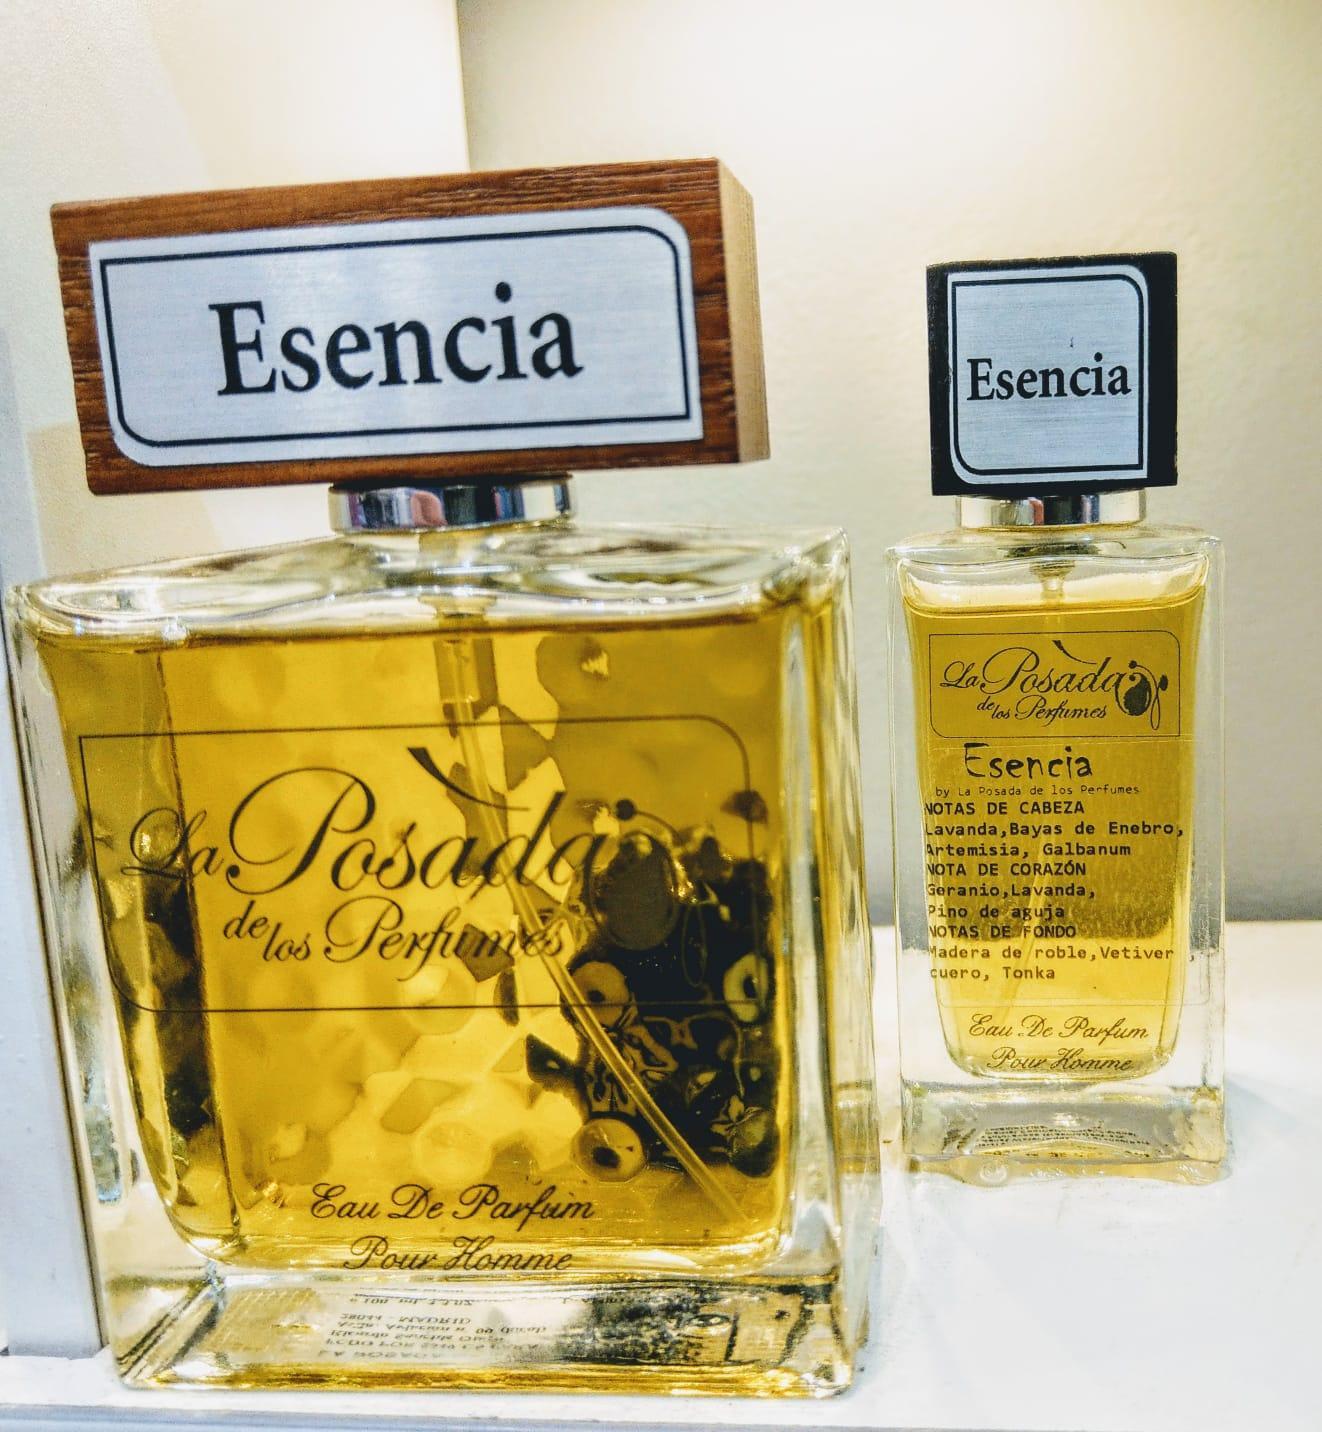 Esencia Eau de Parfum